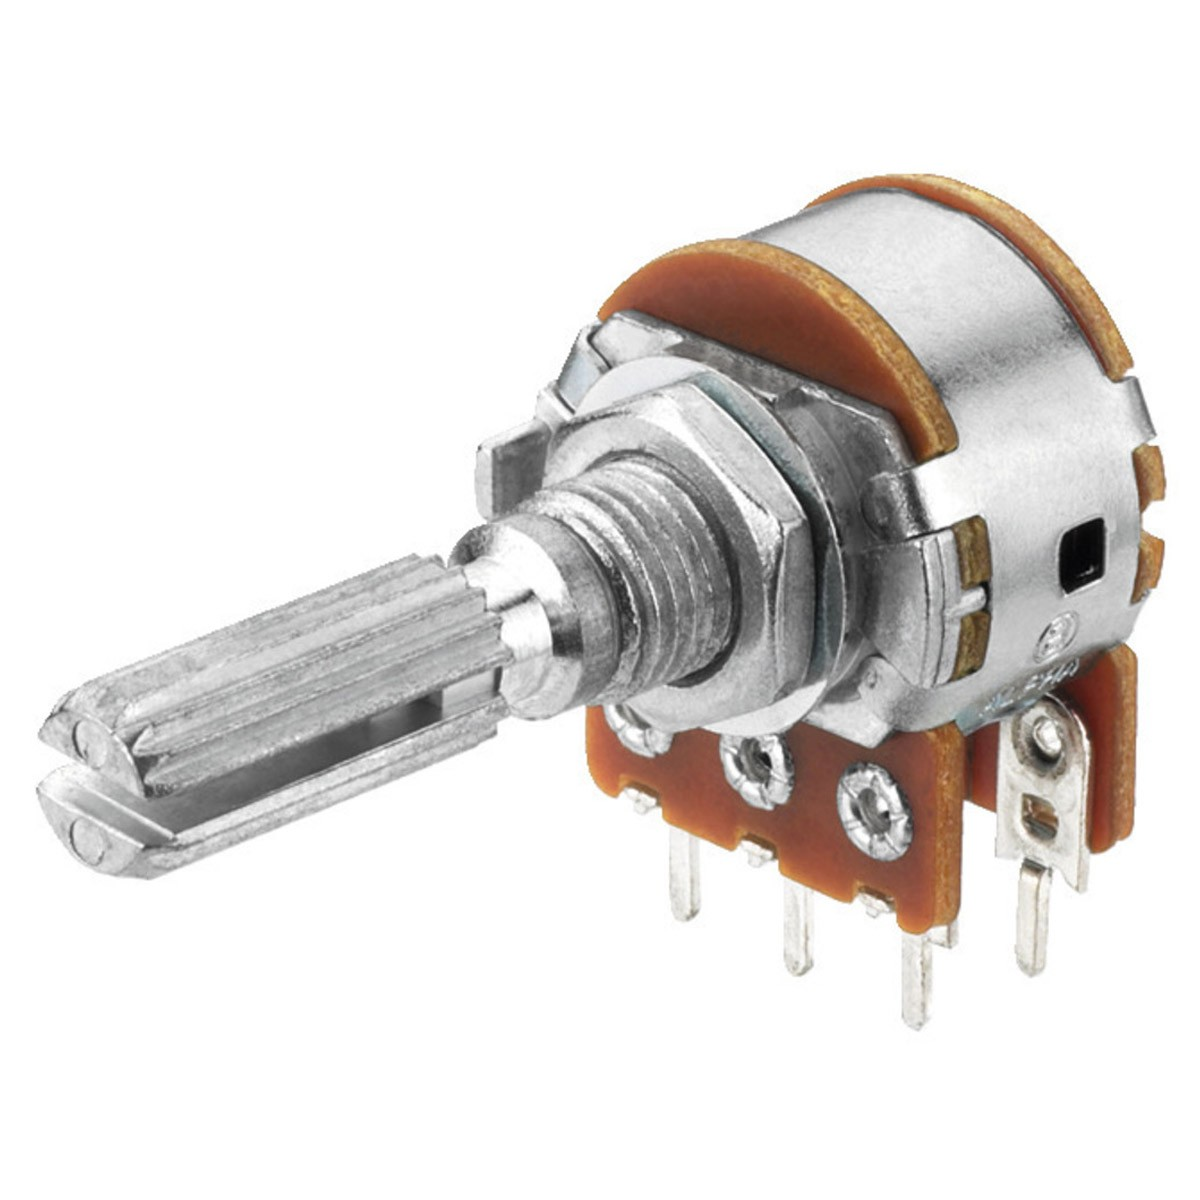 Stereo potentiometer VRB-100S10 10k ohm